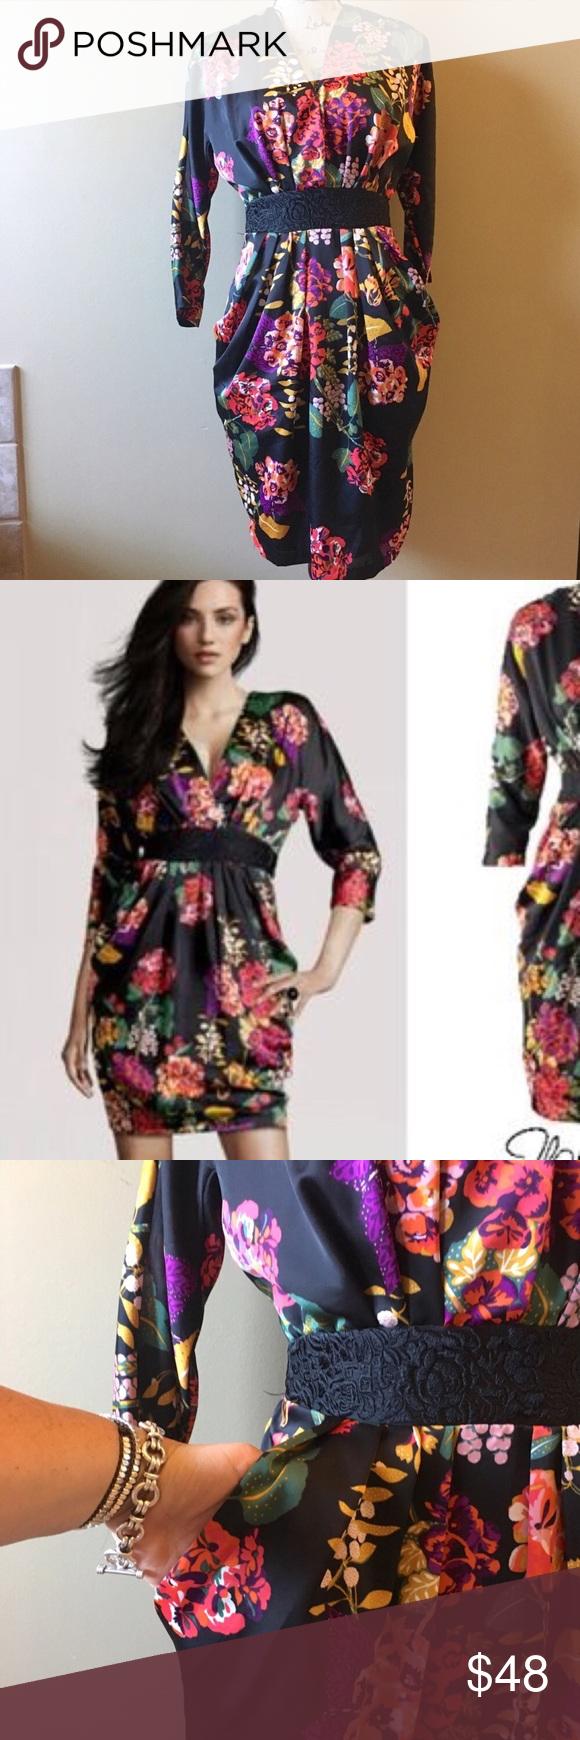 h m conscious collection satin floral dress my posh picks